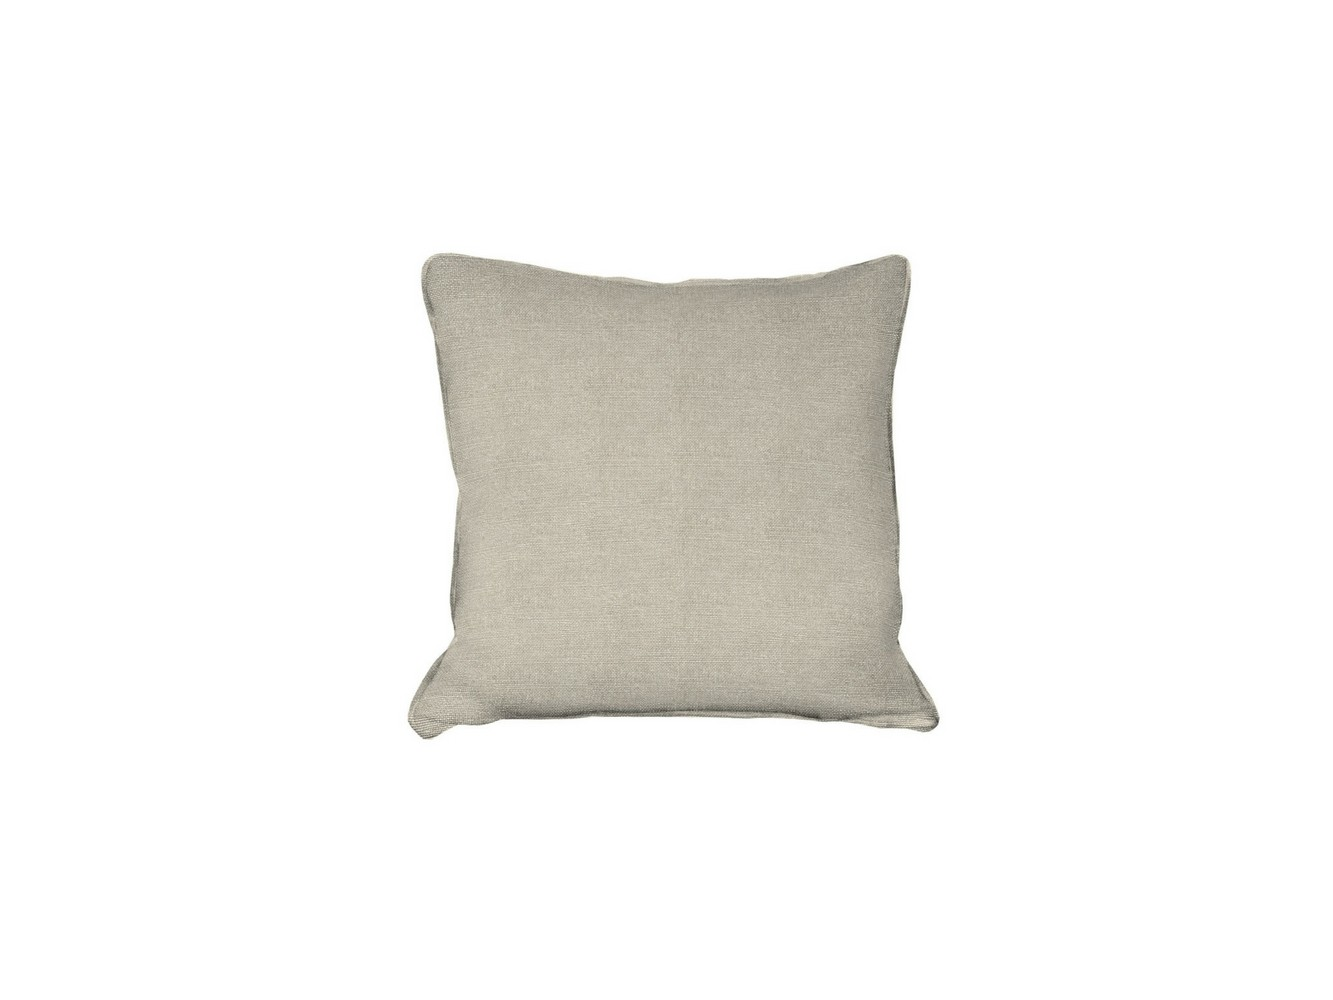 Extra Scatter Cushions - Fabric Hemp